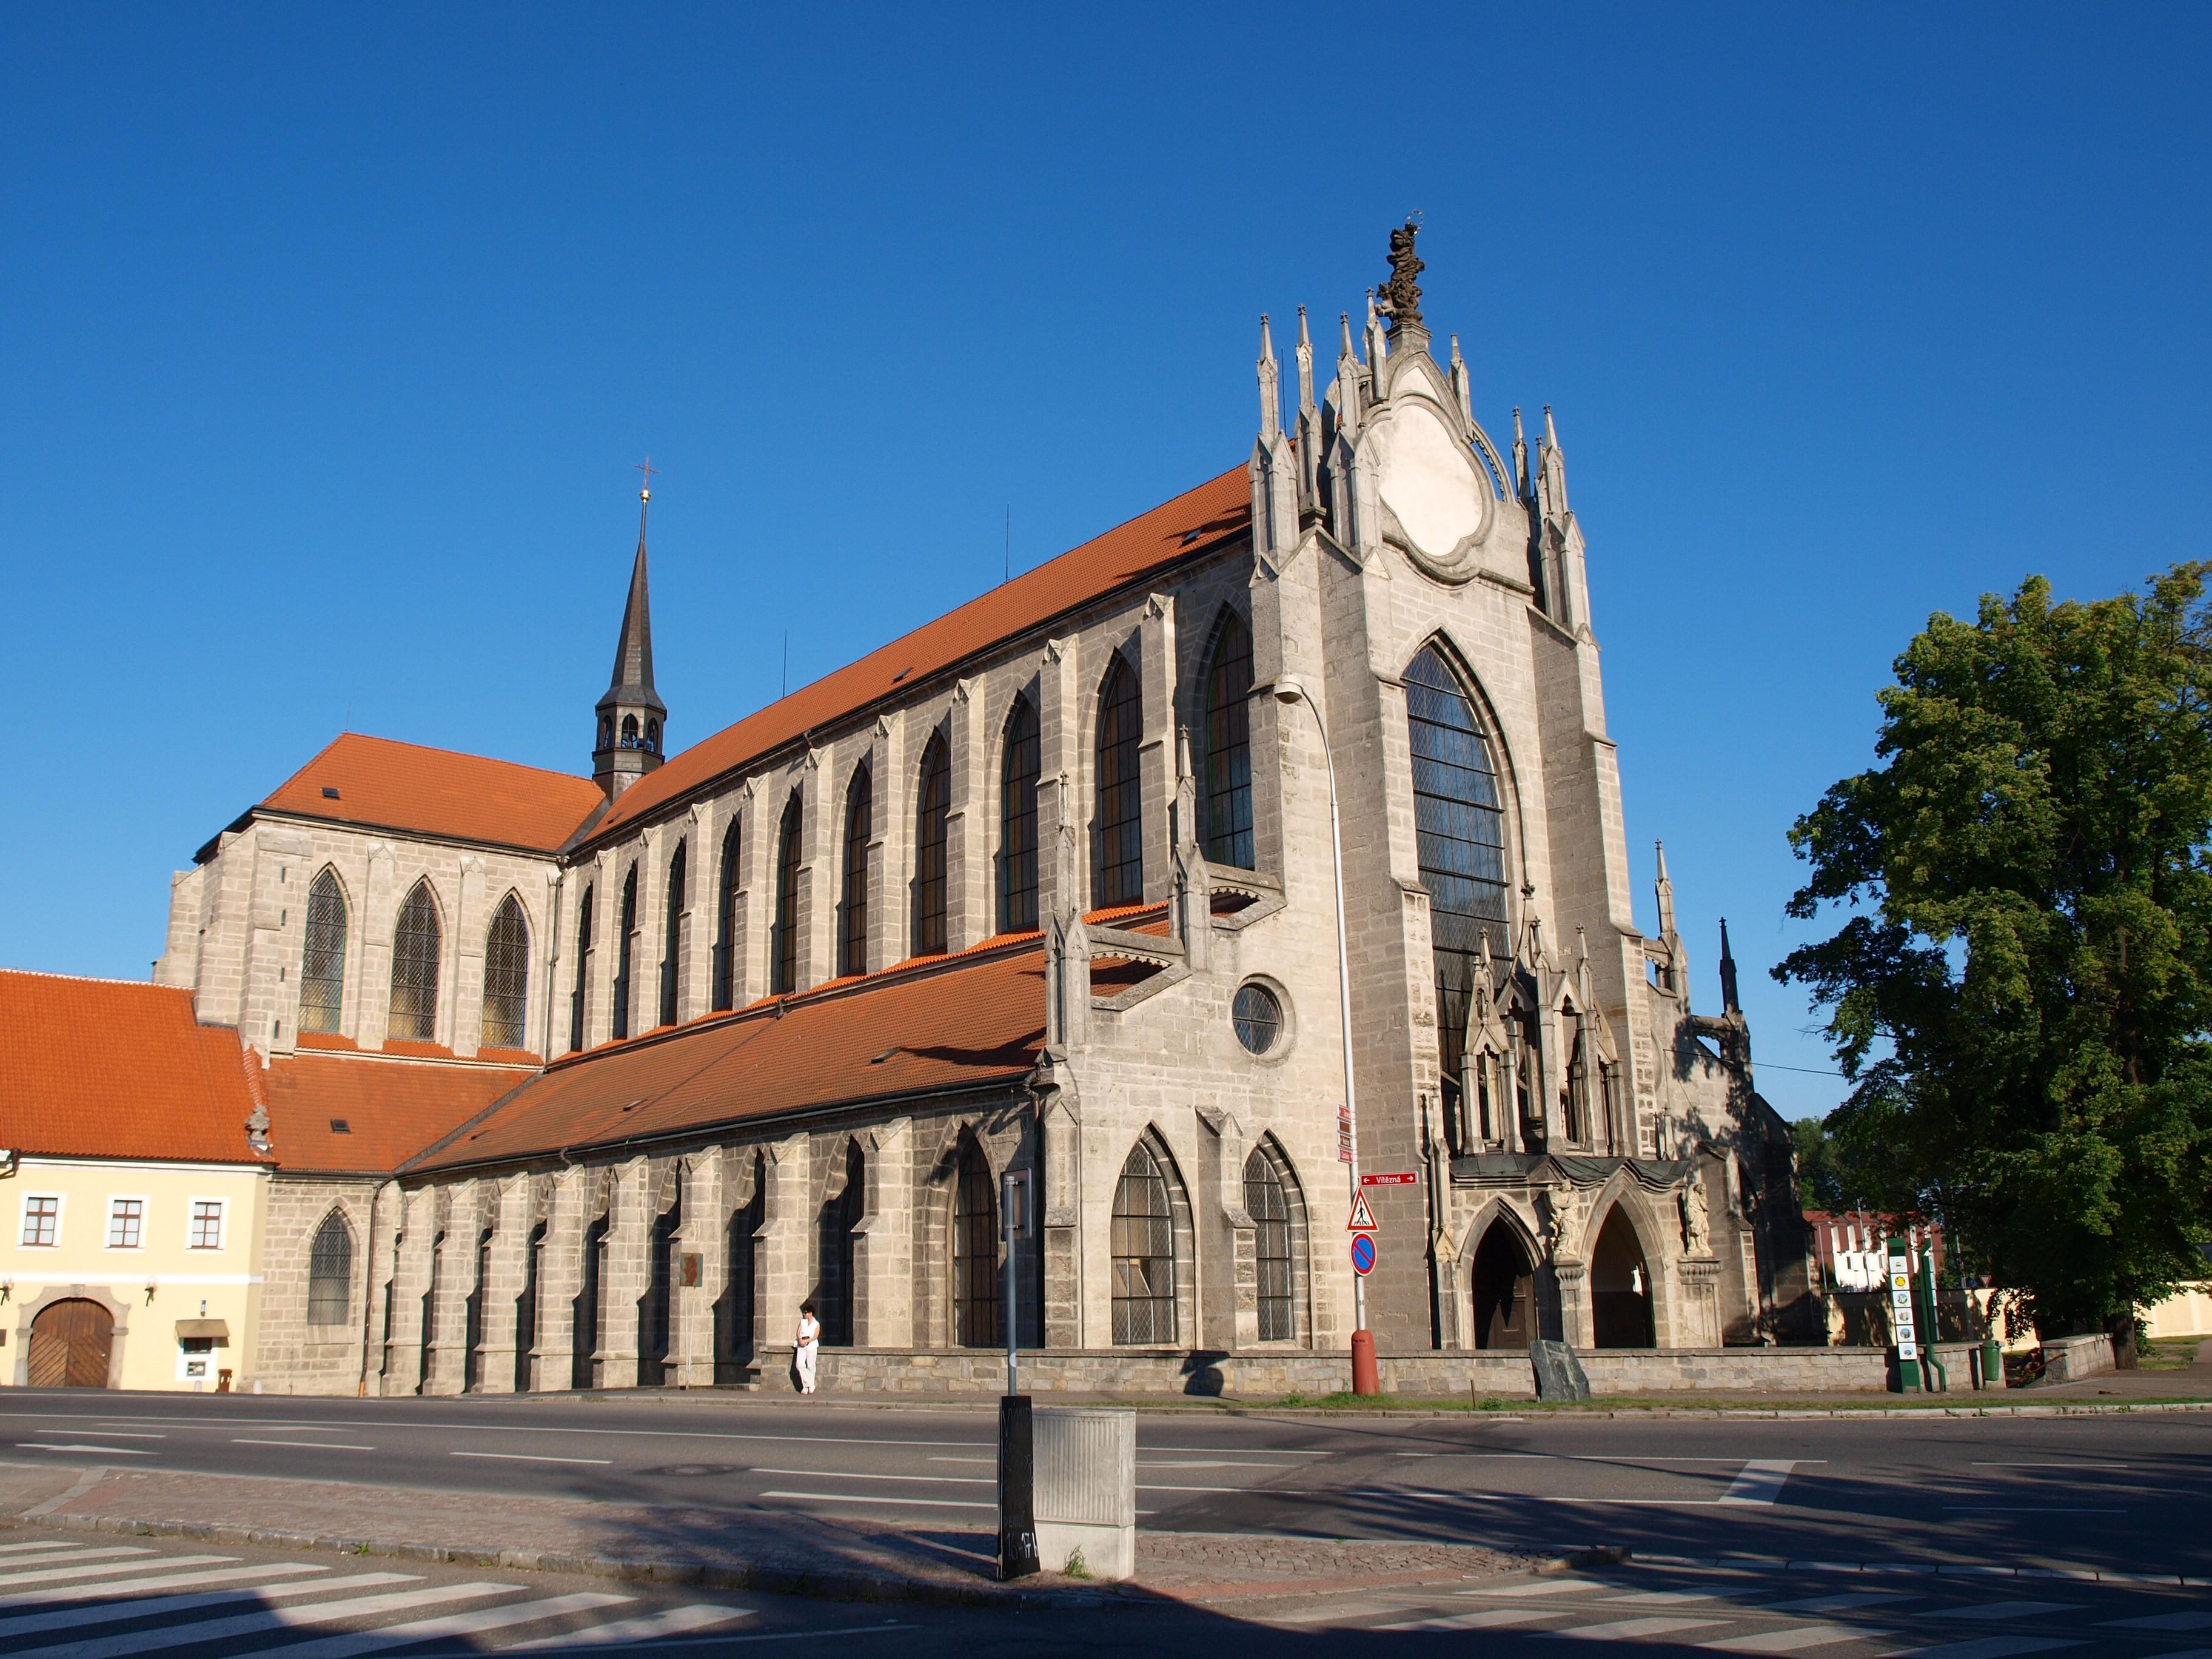 6203-katedrala-nanebevzeti-panny-marie-a-sv-jana-krtitele-cathedral-of-assumption-of-our-lady-and-st-john-the-baptist-2.jpg